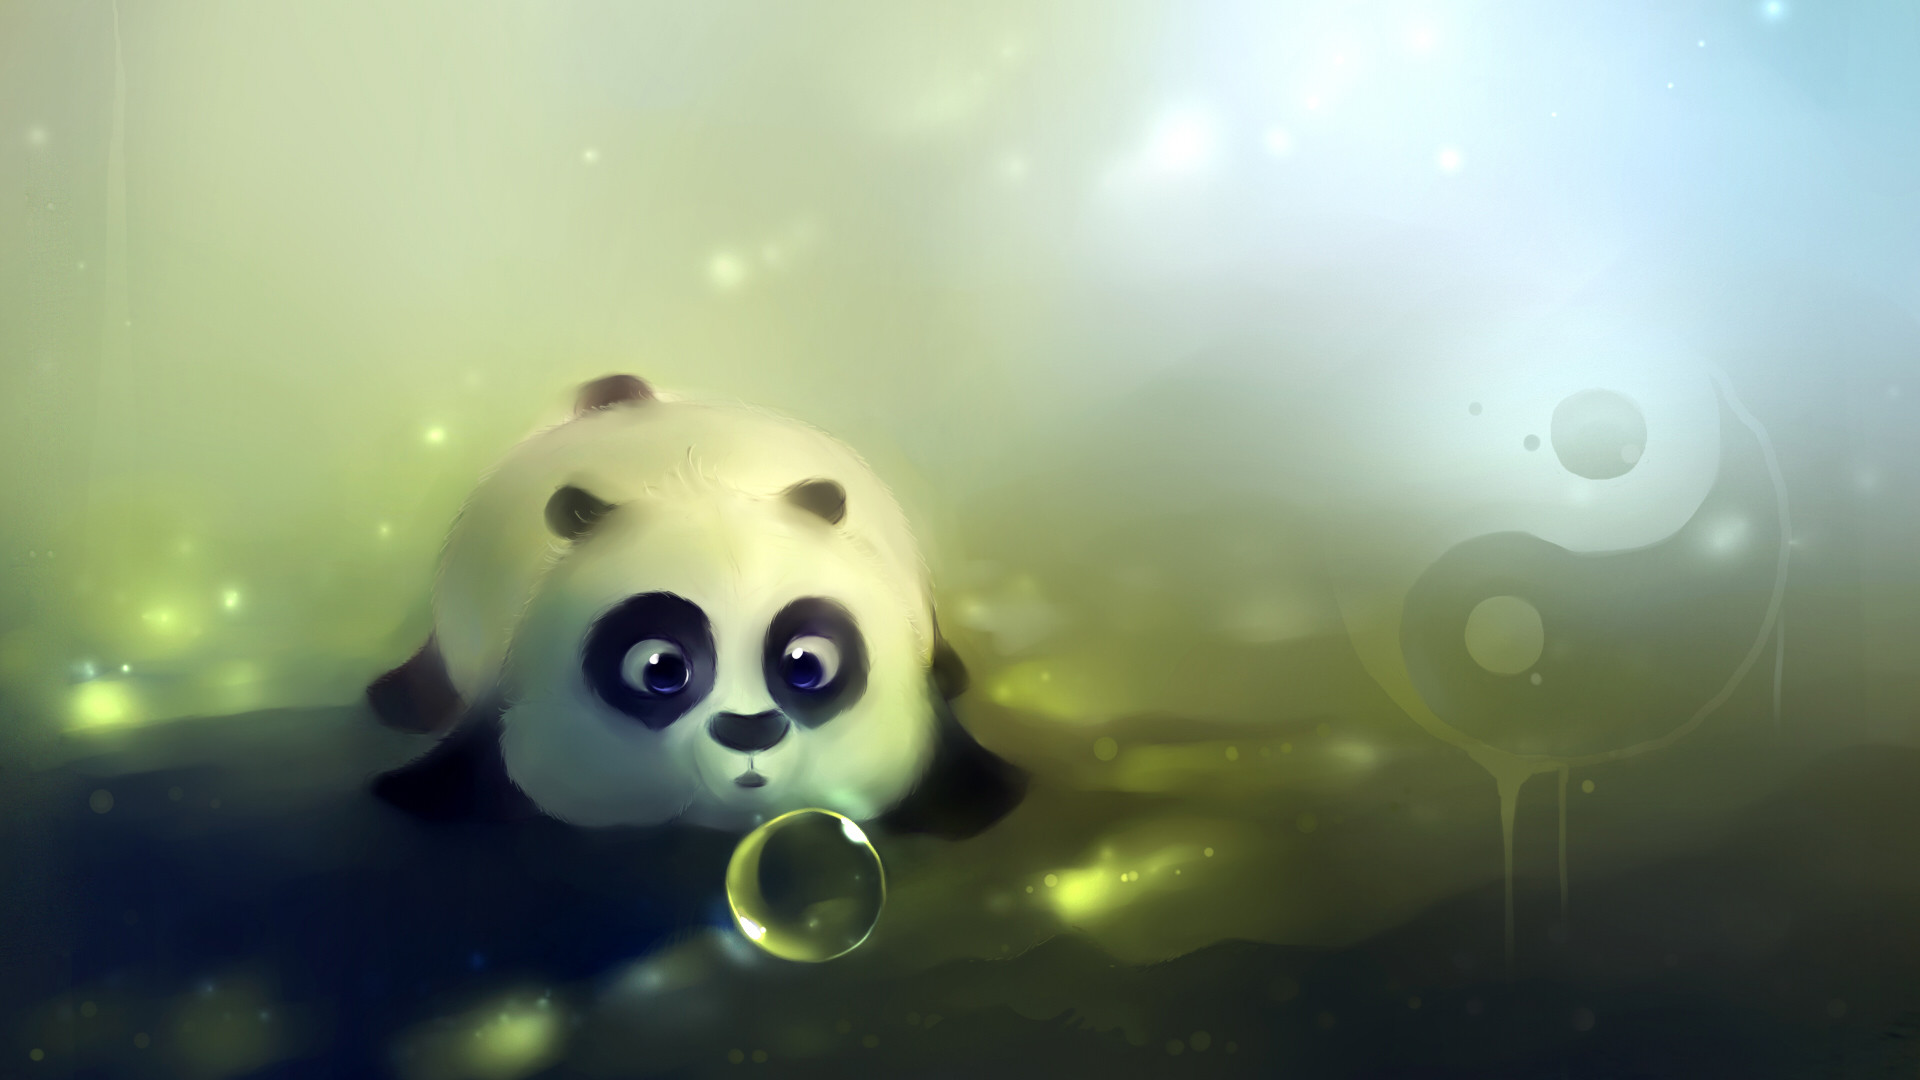 Cute Doll Wallpaper Full Hd Kung Fu Panda Wallpapers 79 Pictures